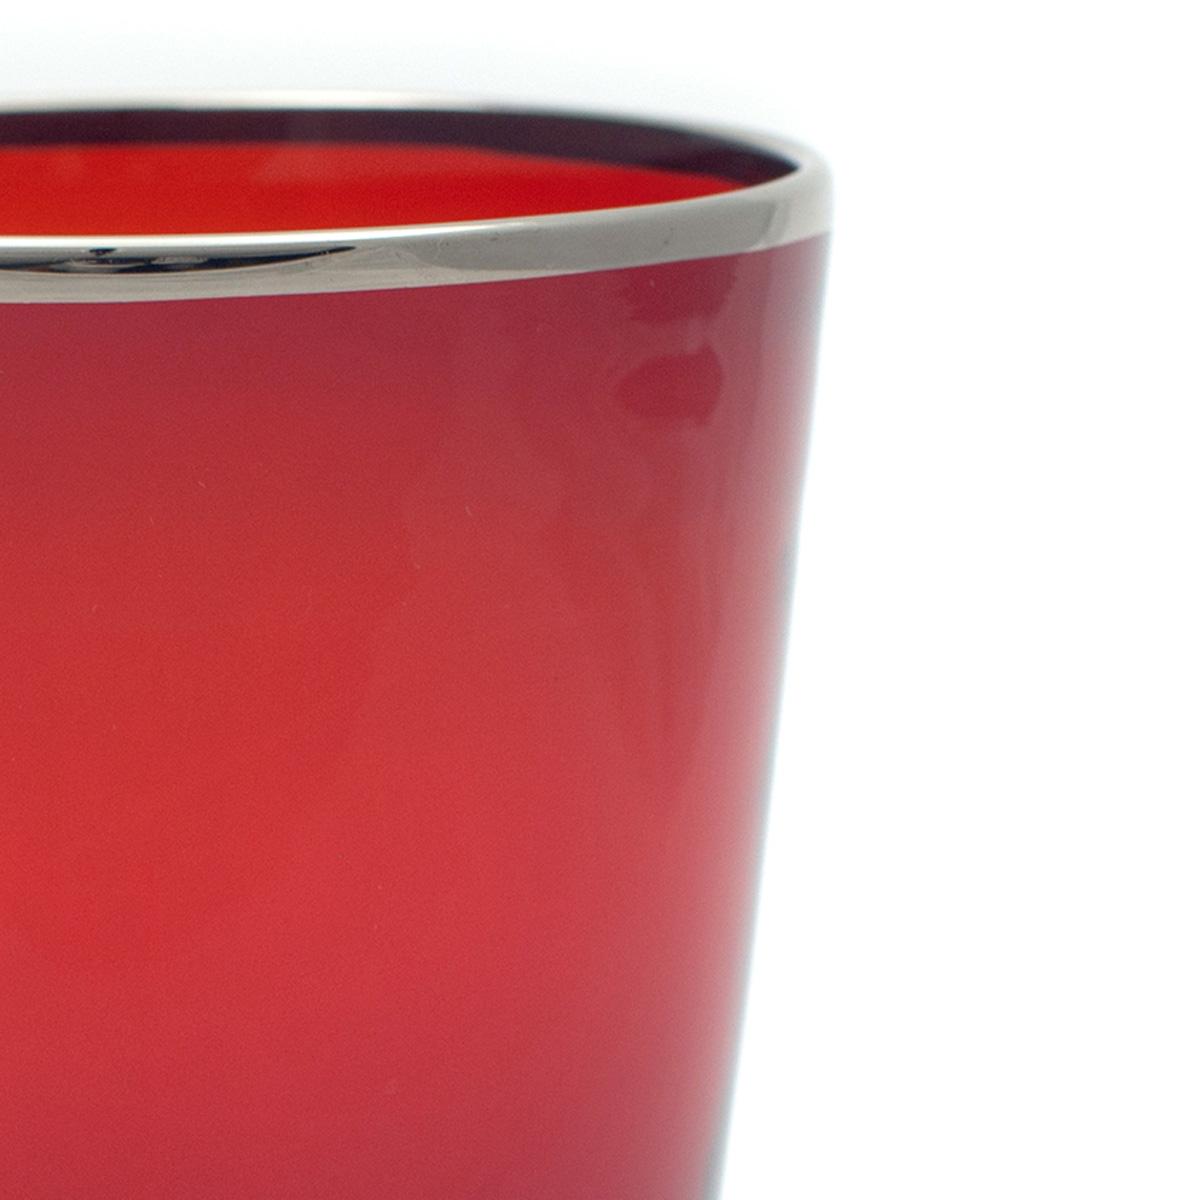 drink_vaso_glass_luxury_interior_design_murano_handmade_red_platinum_detail